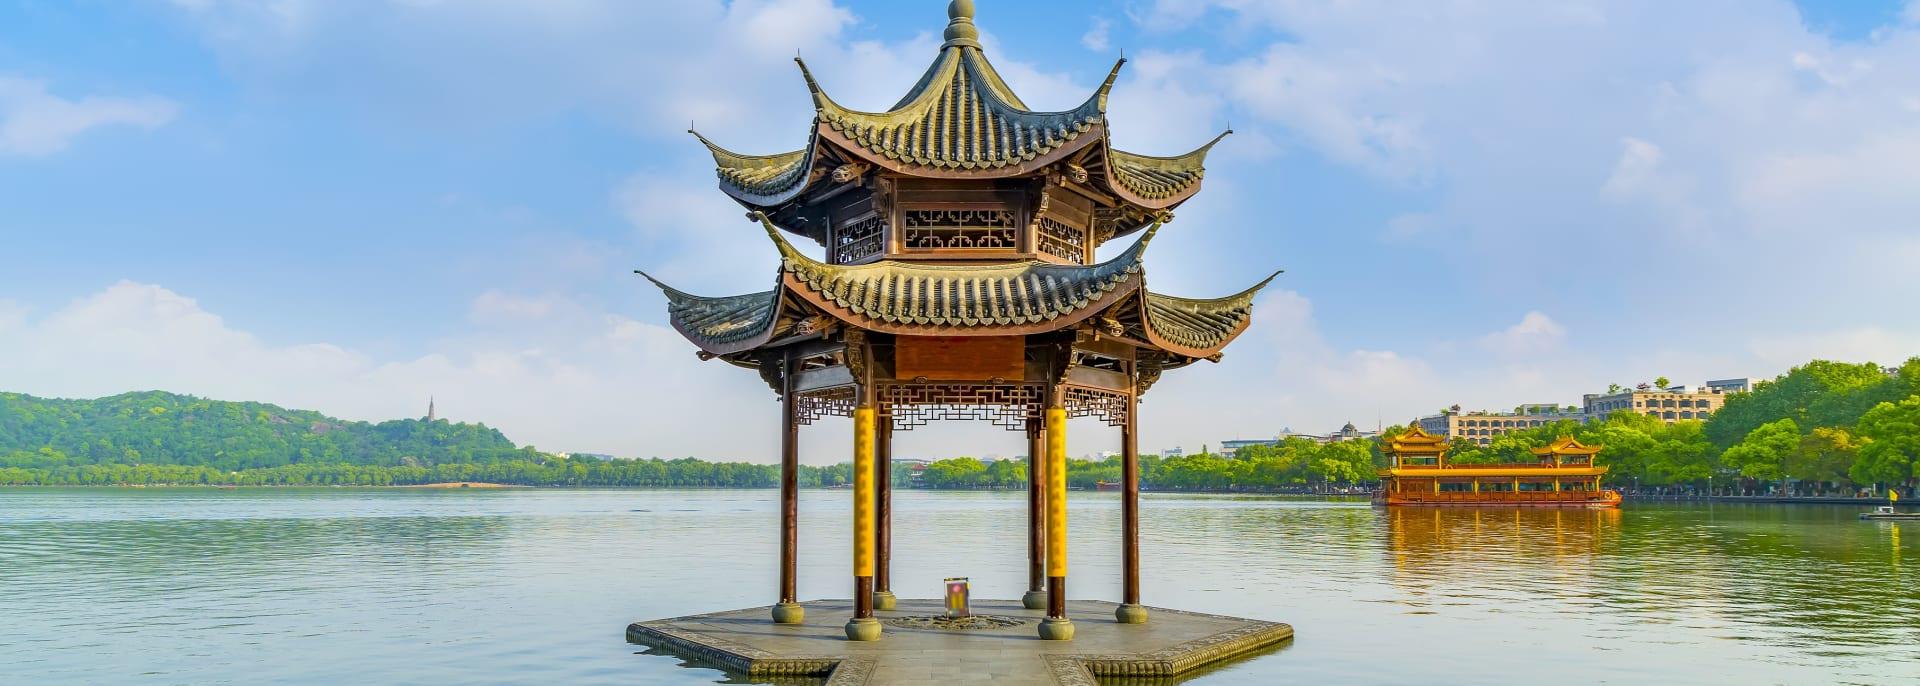 Hangzhou See, China